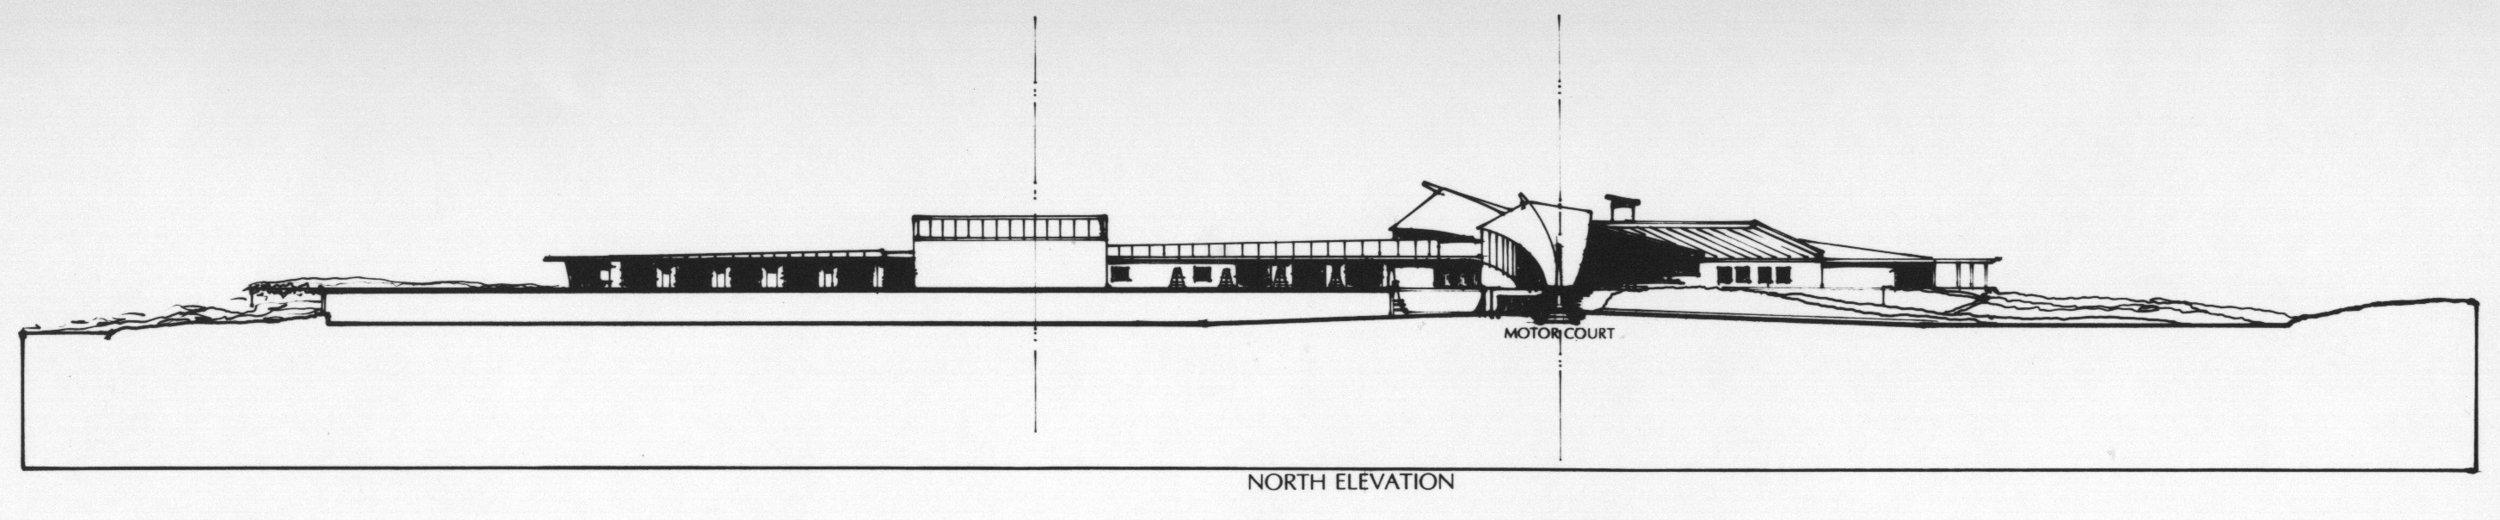 North Elevation.jpg